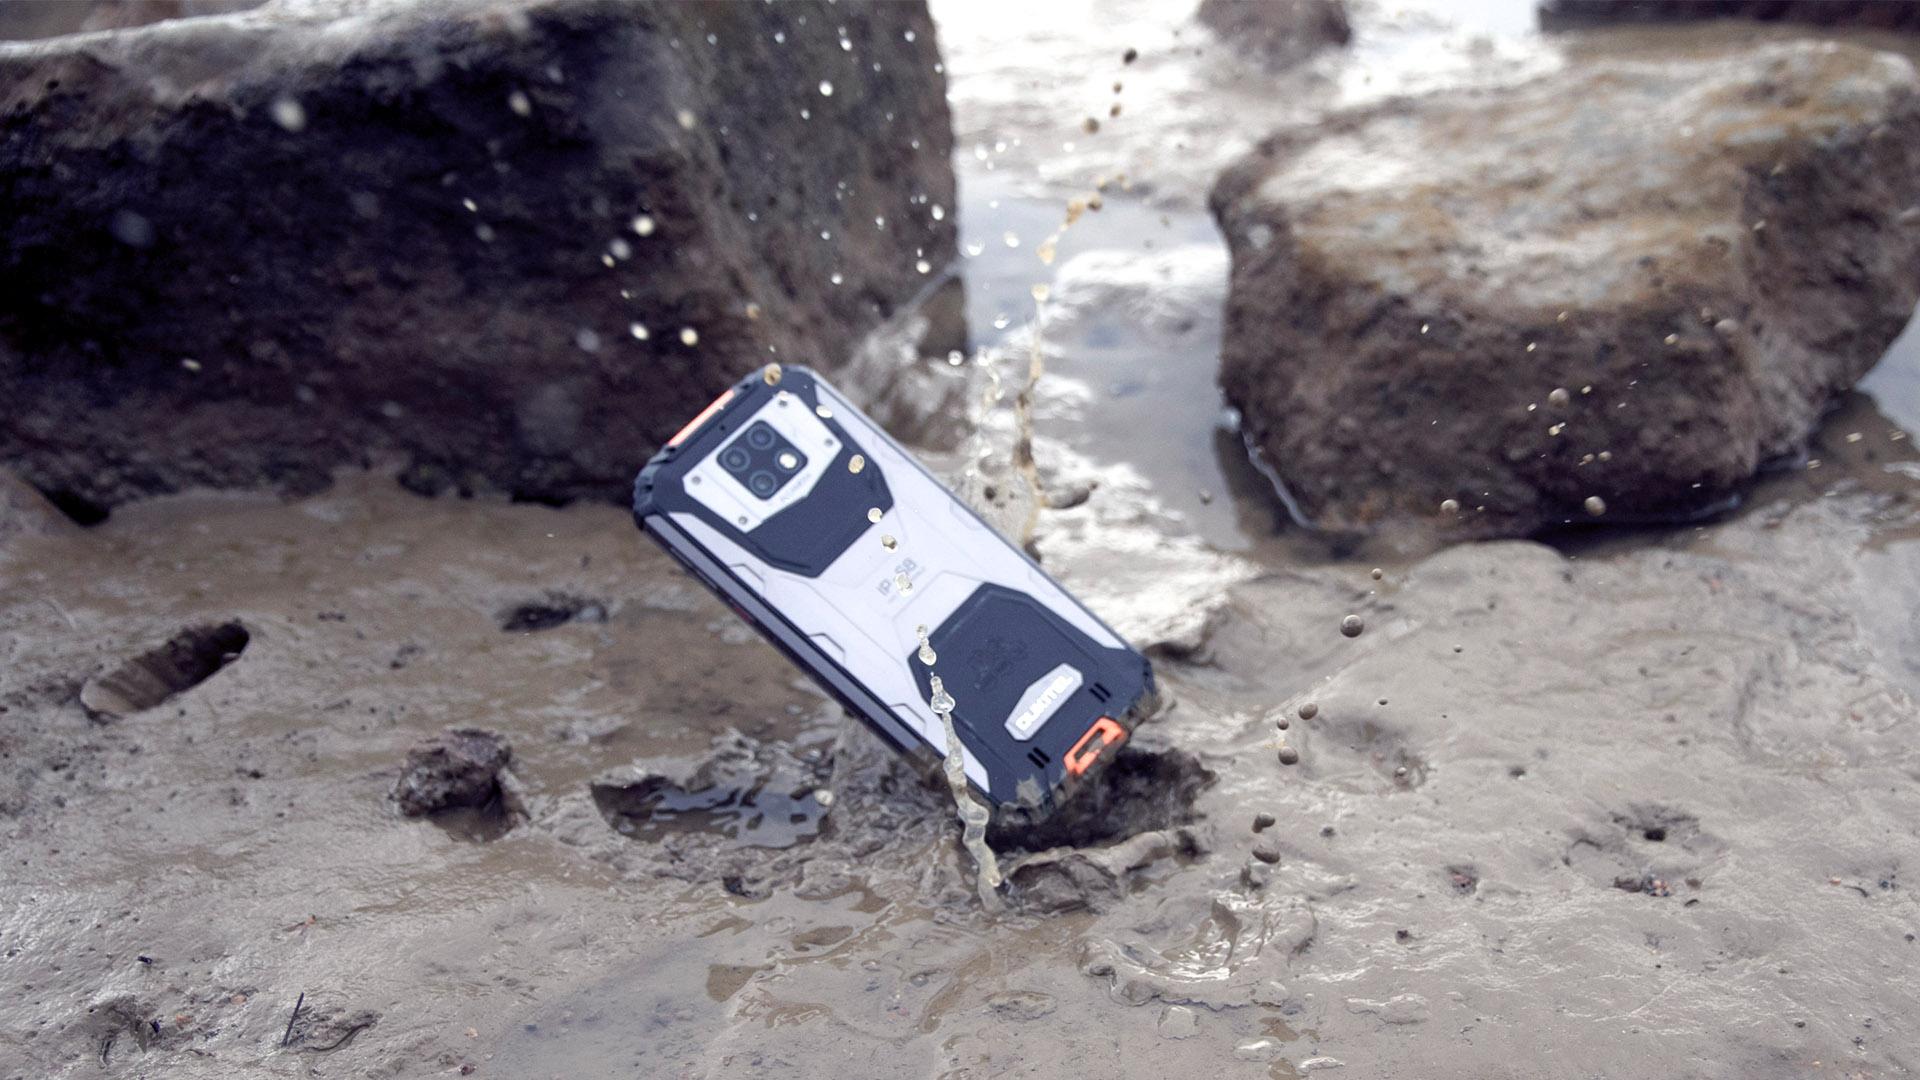 Oukitel WP6 ударо, водо устойчив смартфон